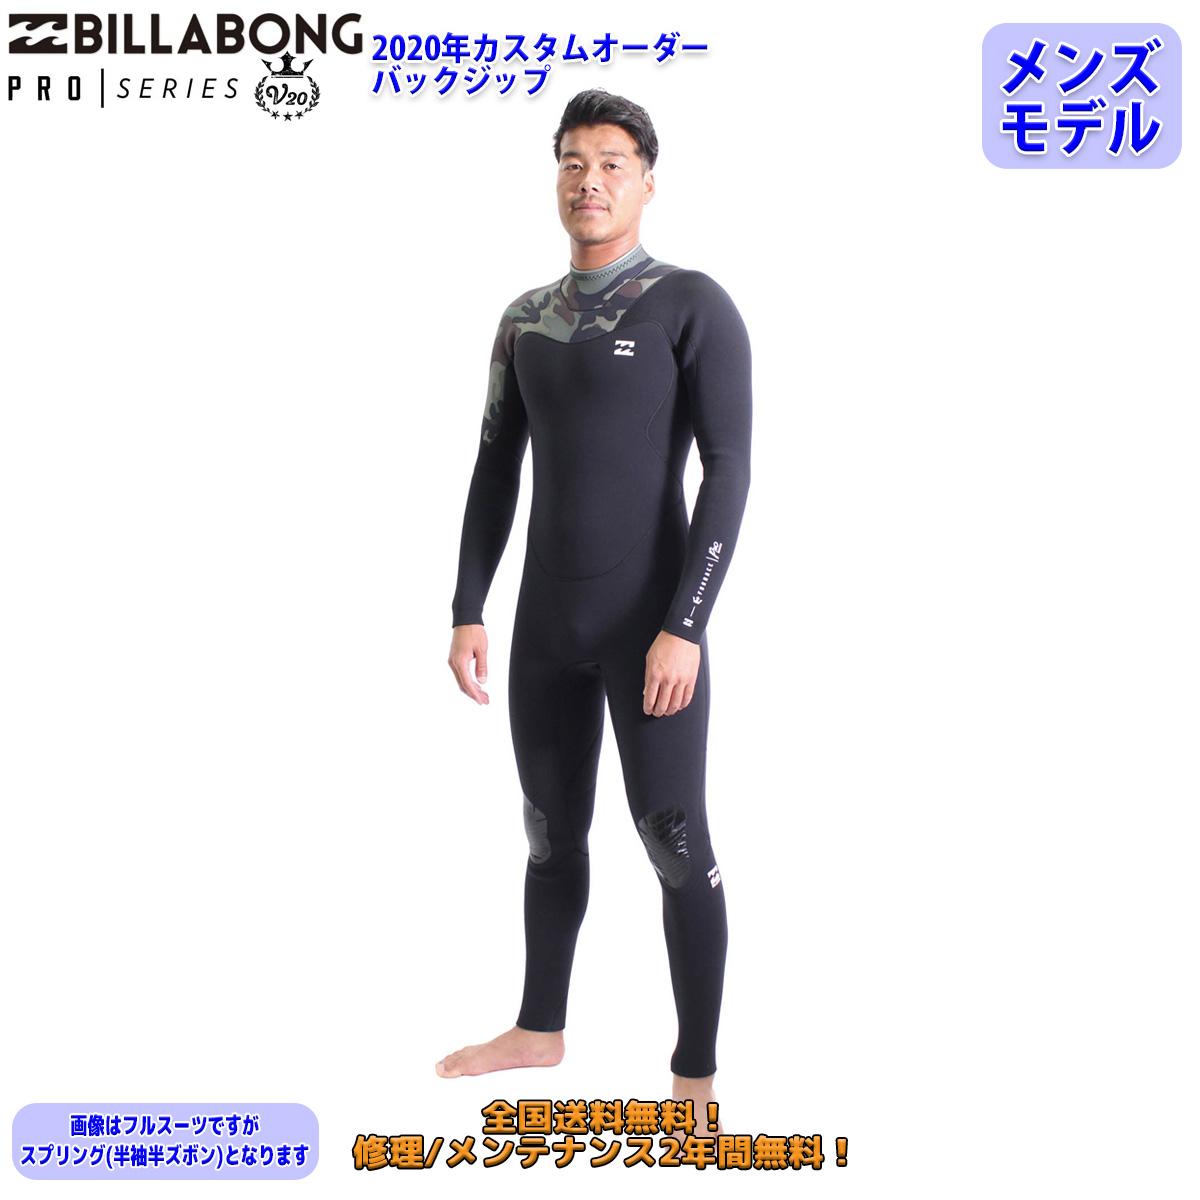 20 BILLABONG ビラボン スプリング バックジップ ウェットスーツ ウエットスーツ カスタム オーダー 春夏用 メンズモデル 2020年 品番 BA018-454 日本正規品